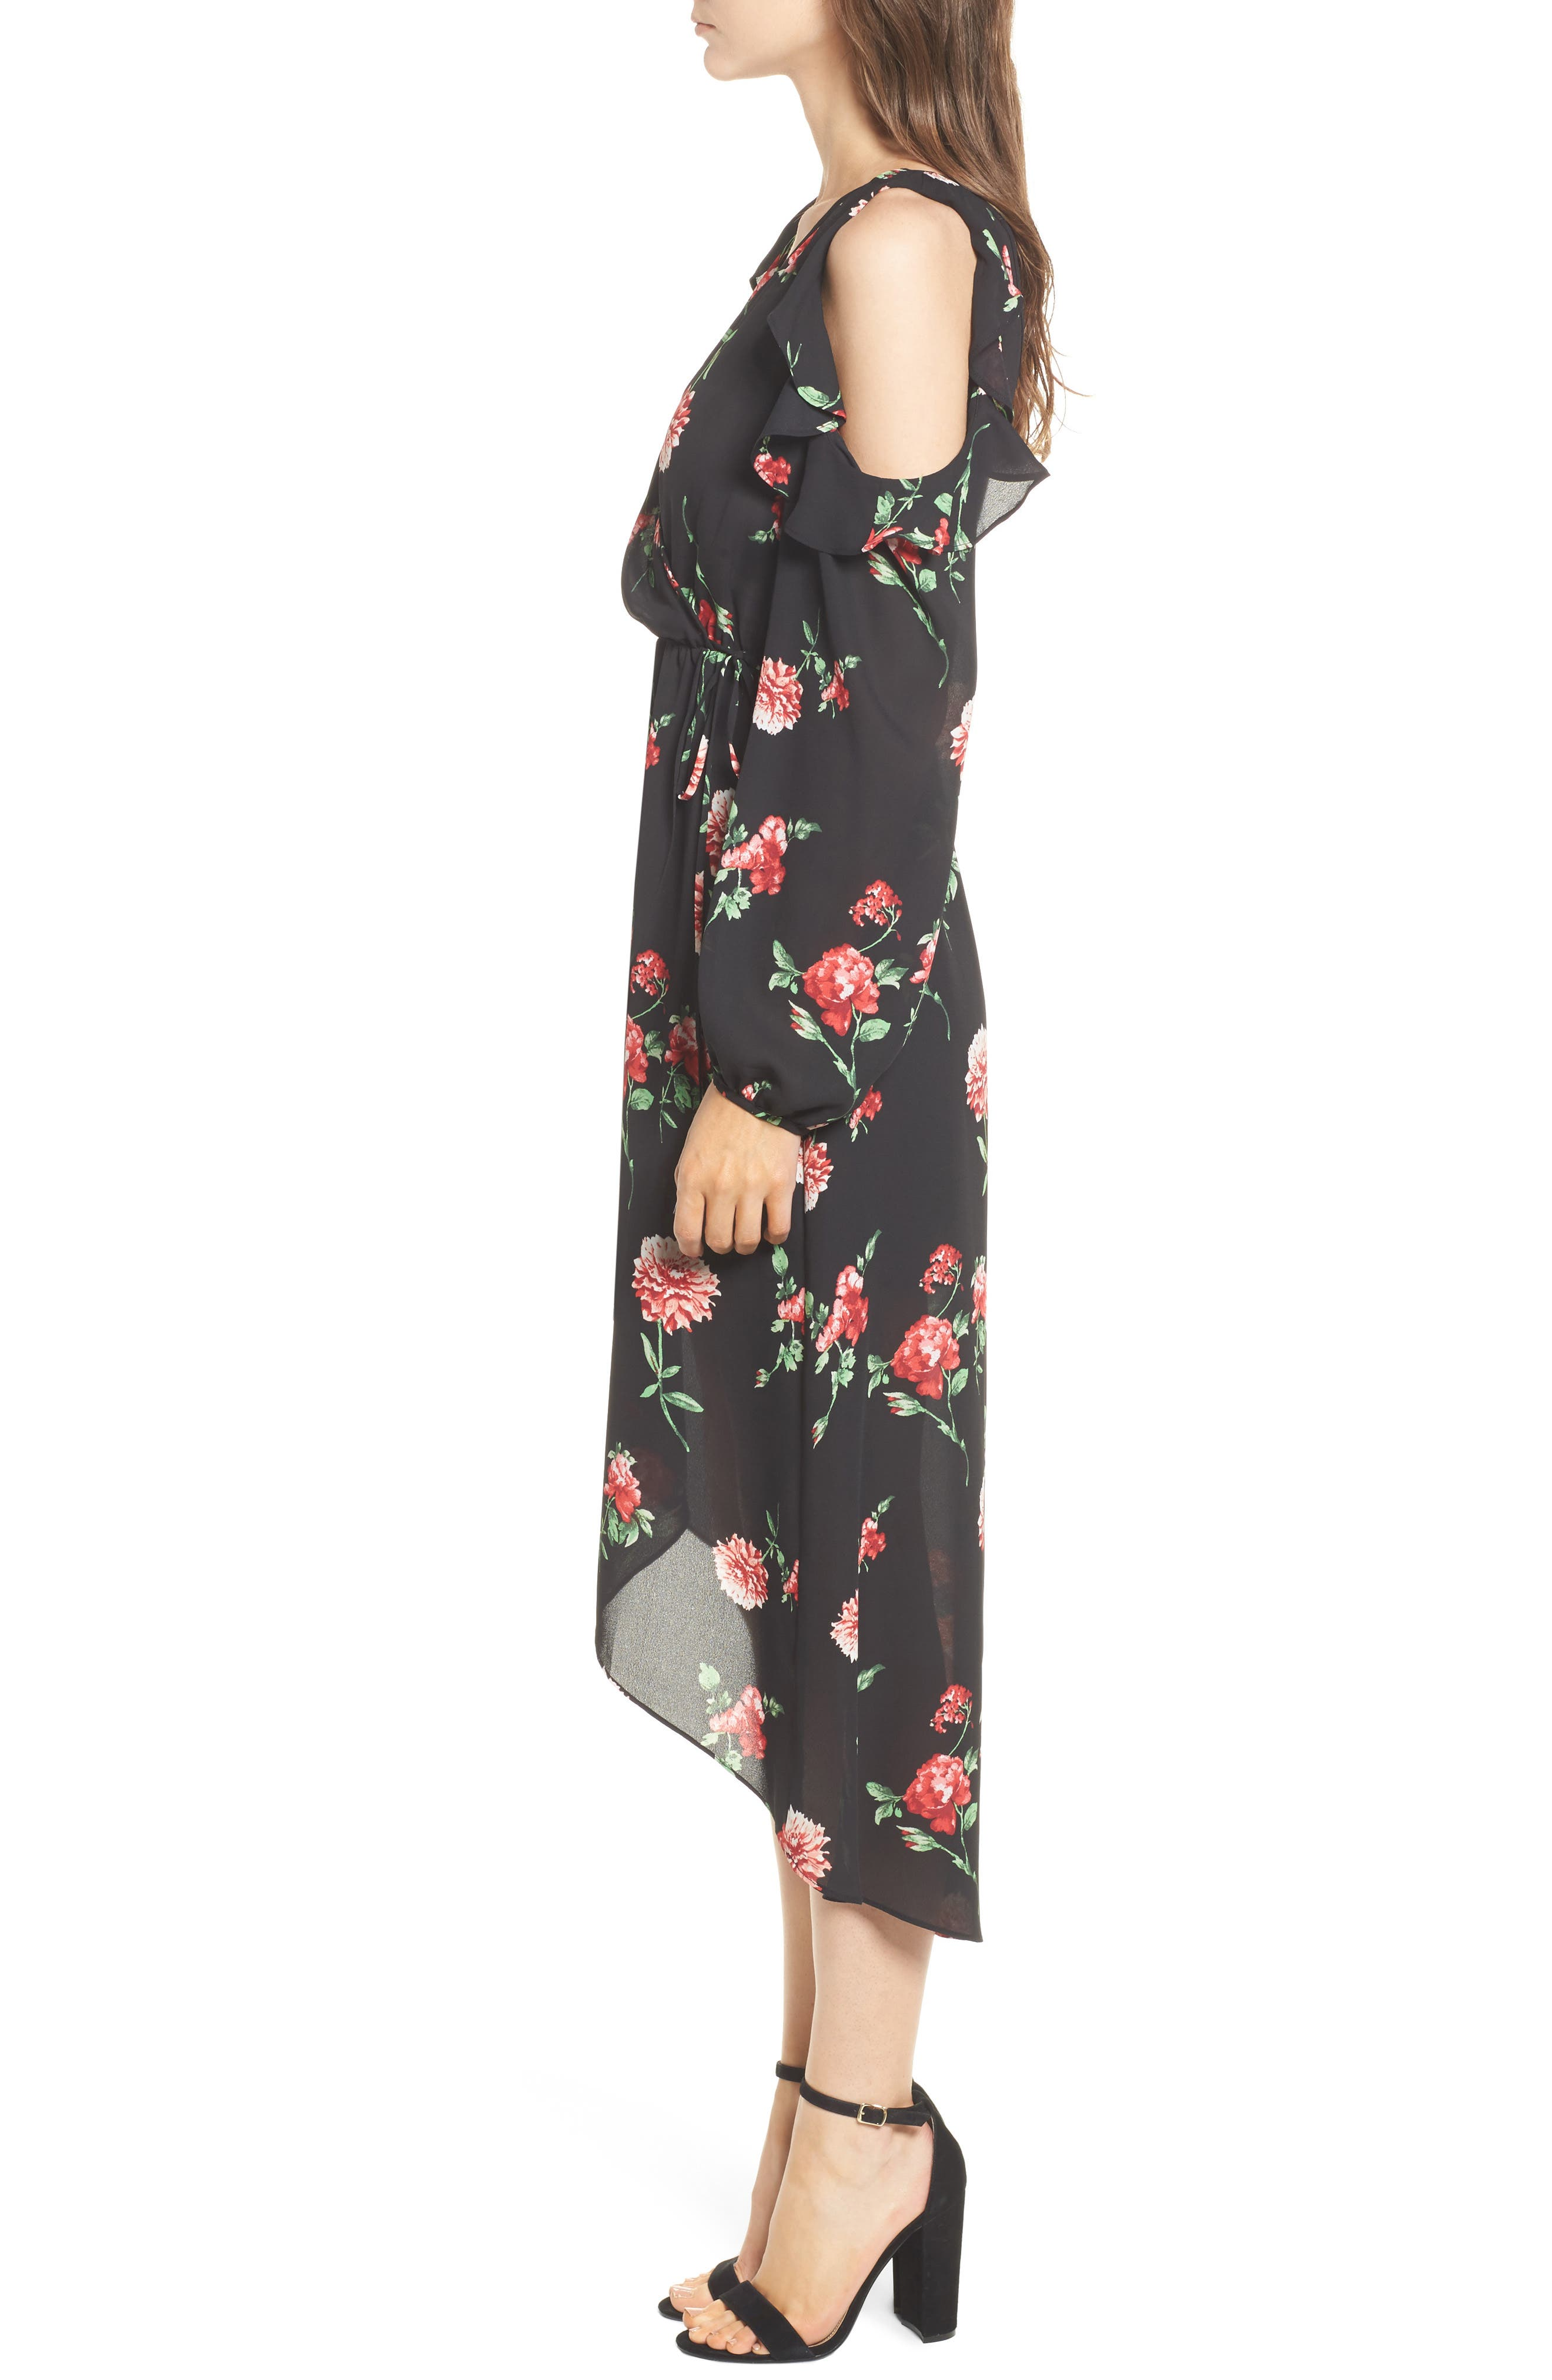 Ruffle Cold Shoulder Faux Wrap Dress,                             Alternate thumbnail 3, color,                             750 Black Red